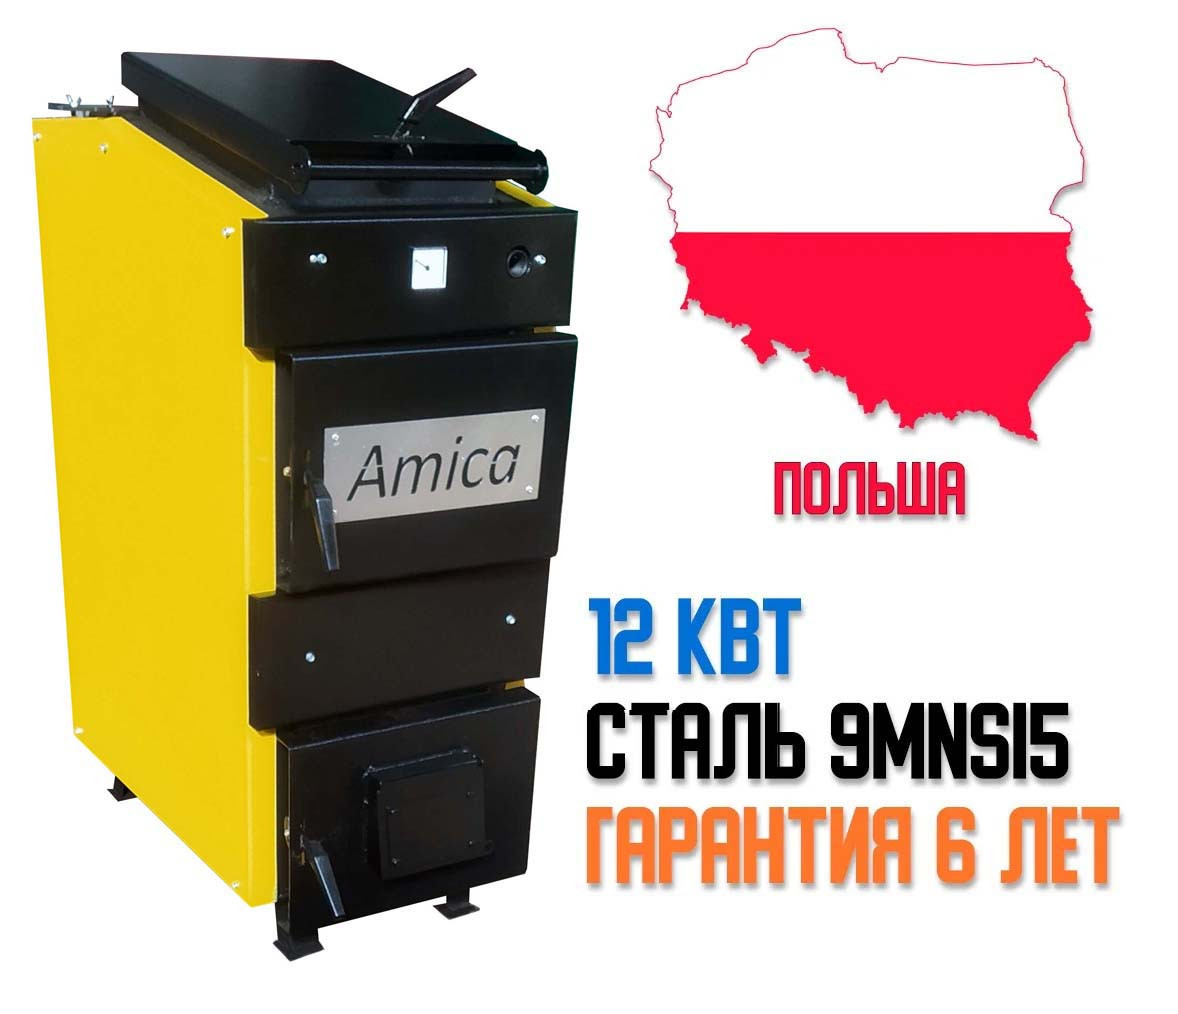 "Котел Холмова ""Amica"" Profi 12 кВт. Бесплатная Доставка!"